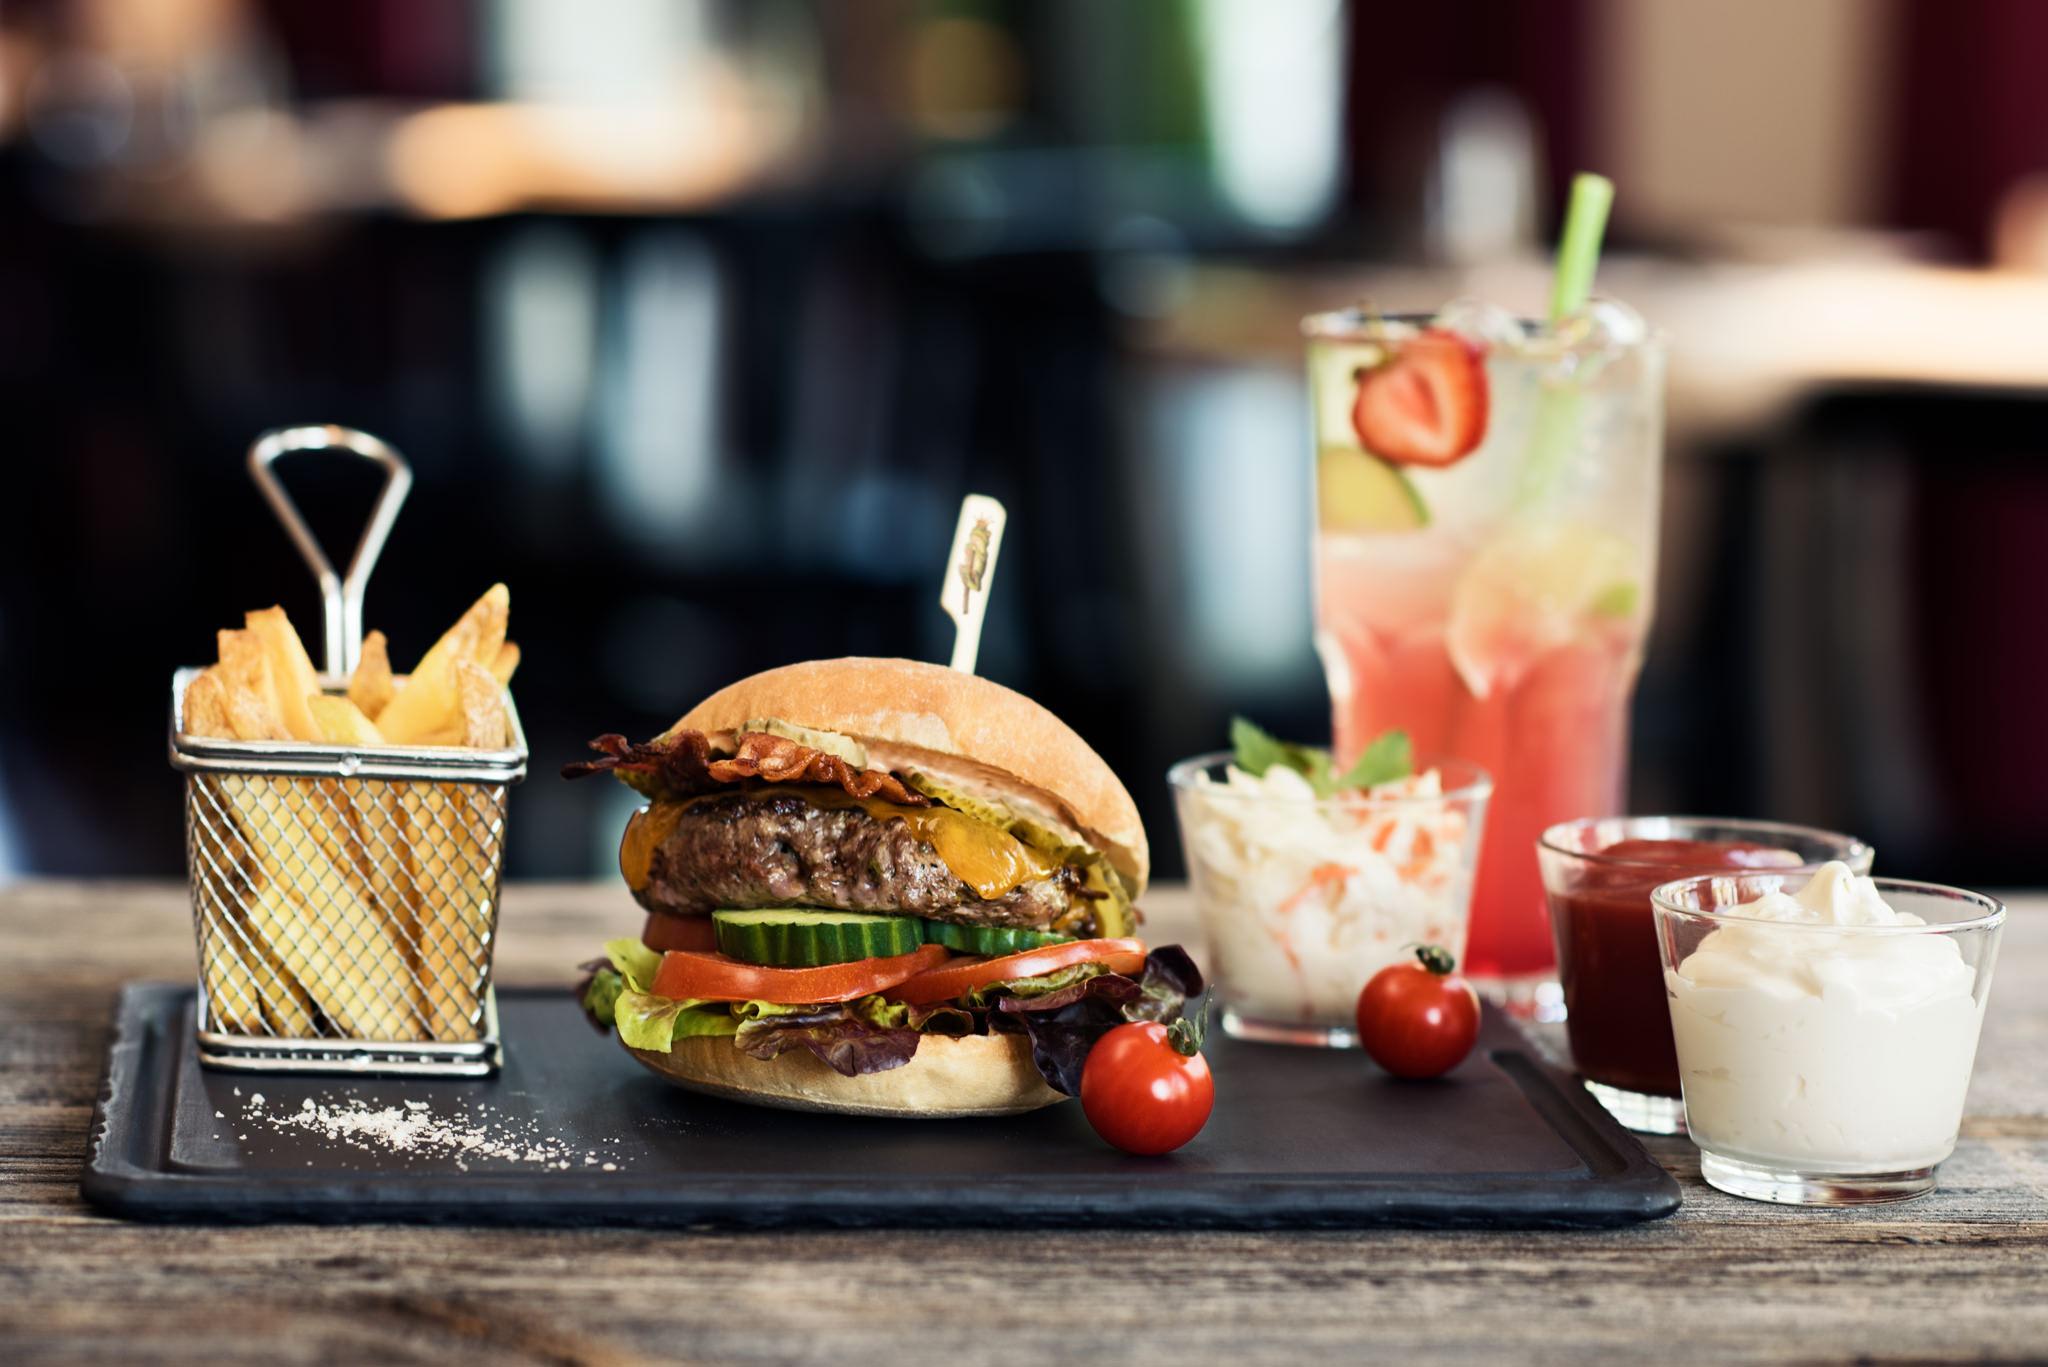 Grimm's Hotel Potsdamer Platz Burger